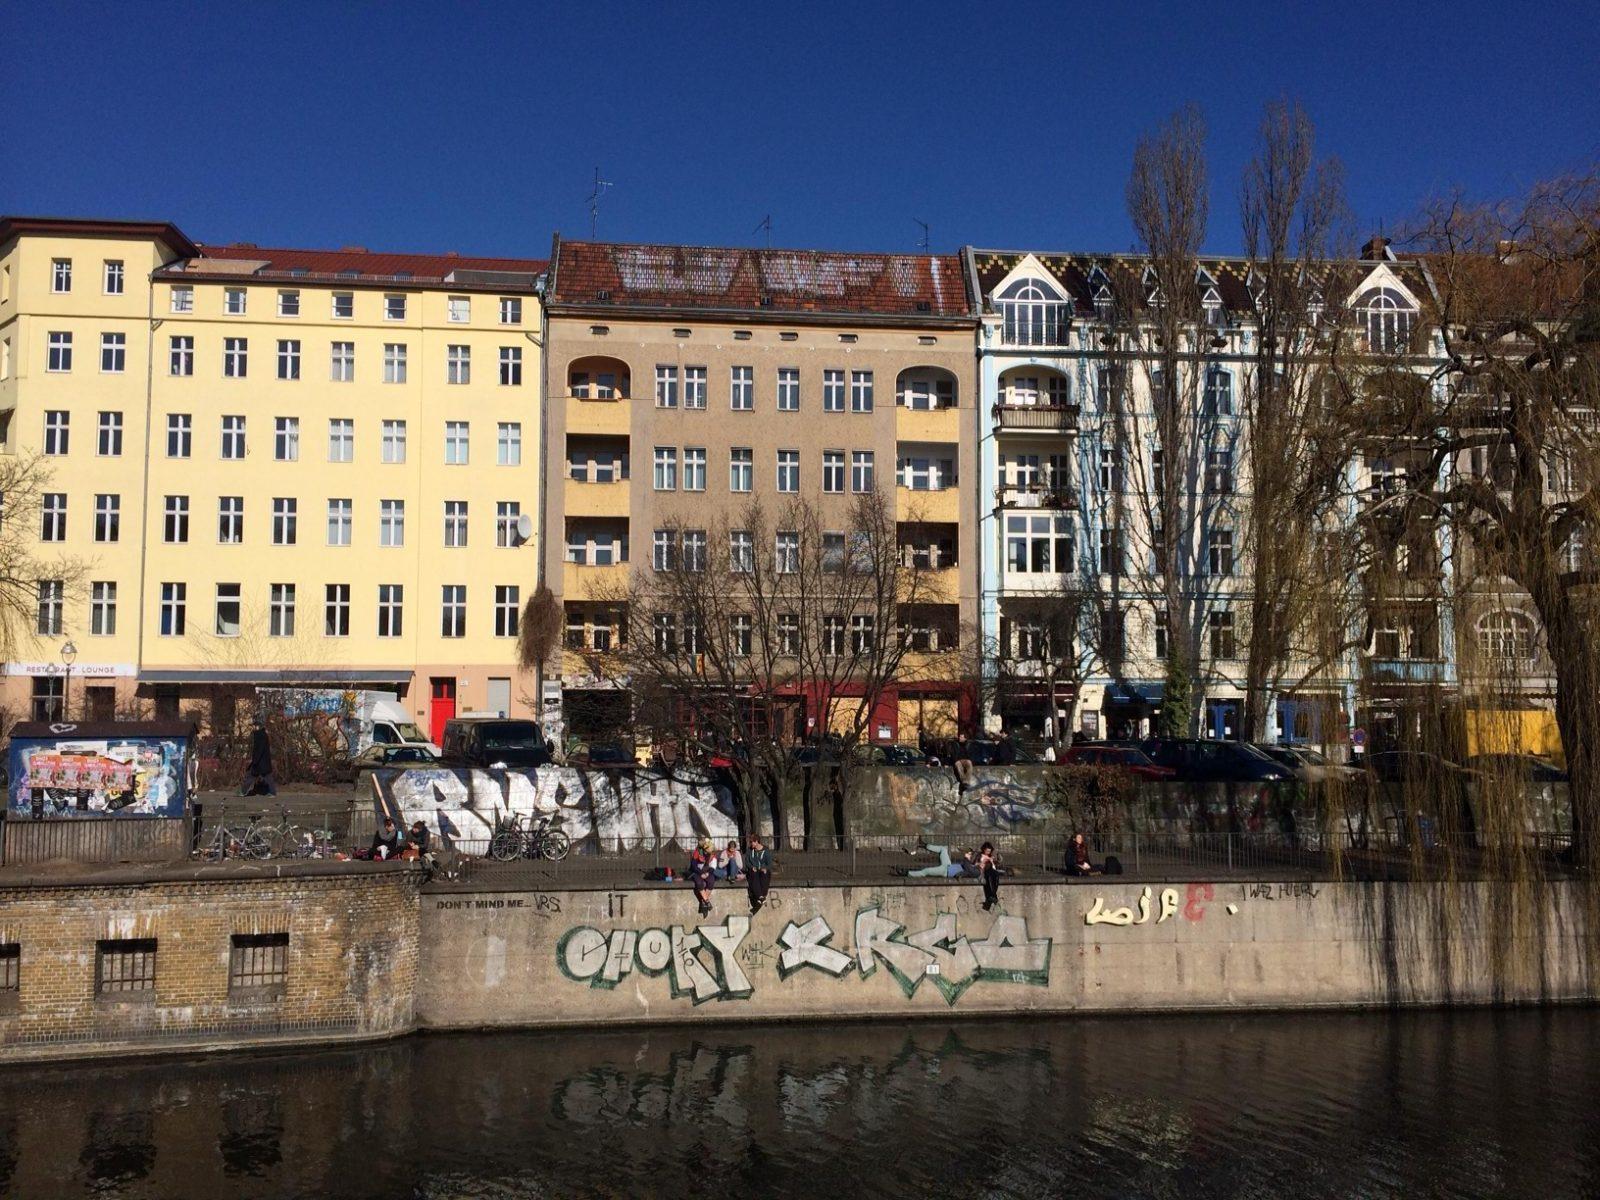 Landwehr Canal - Paul Lincke-Ufer